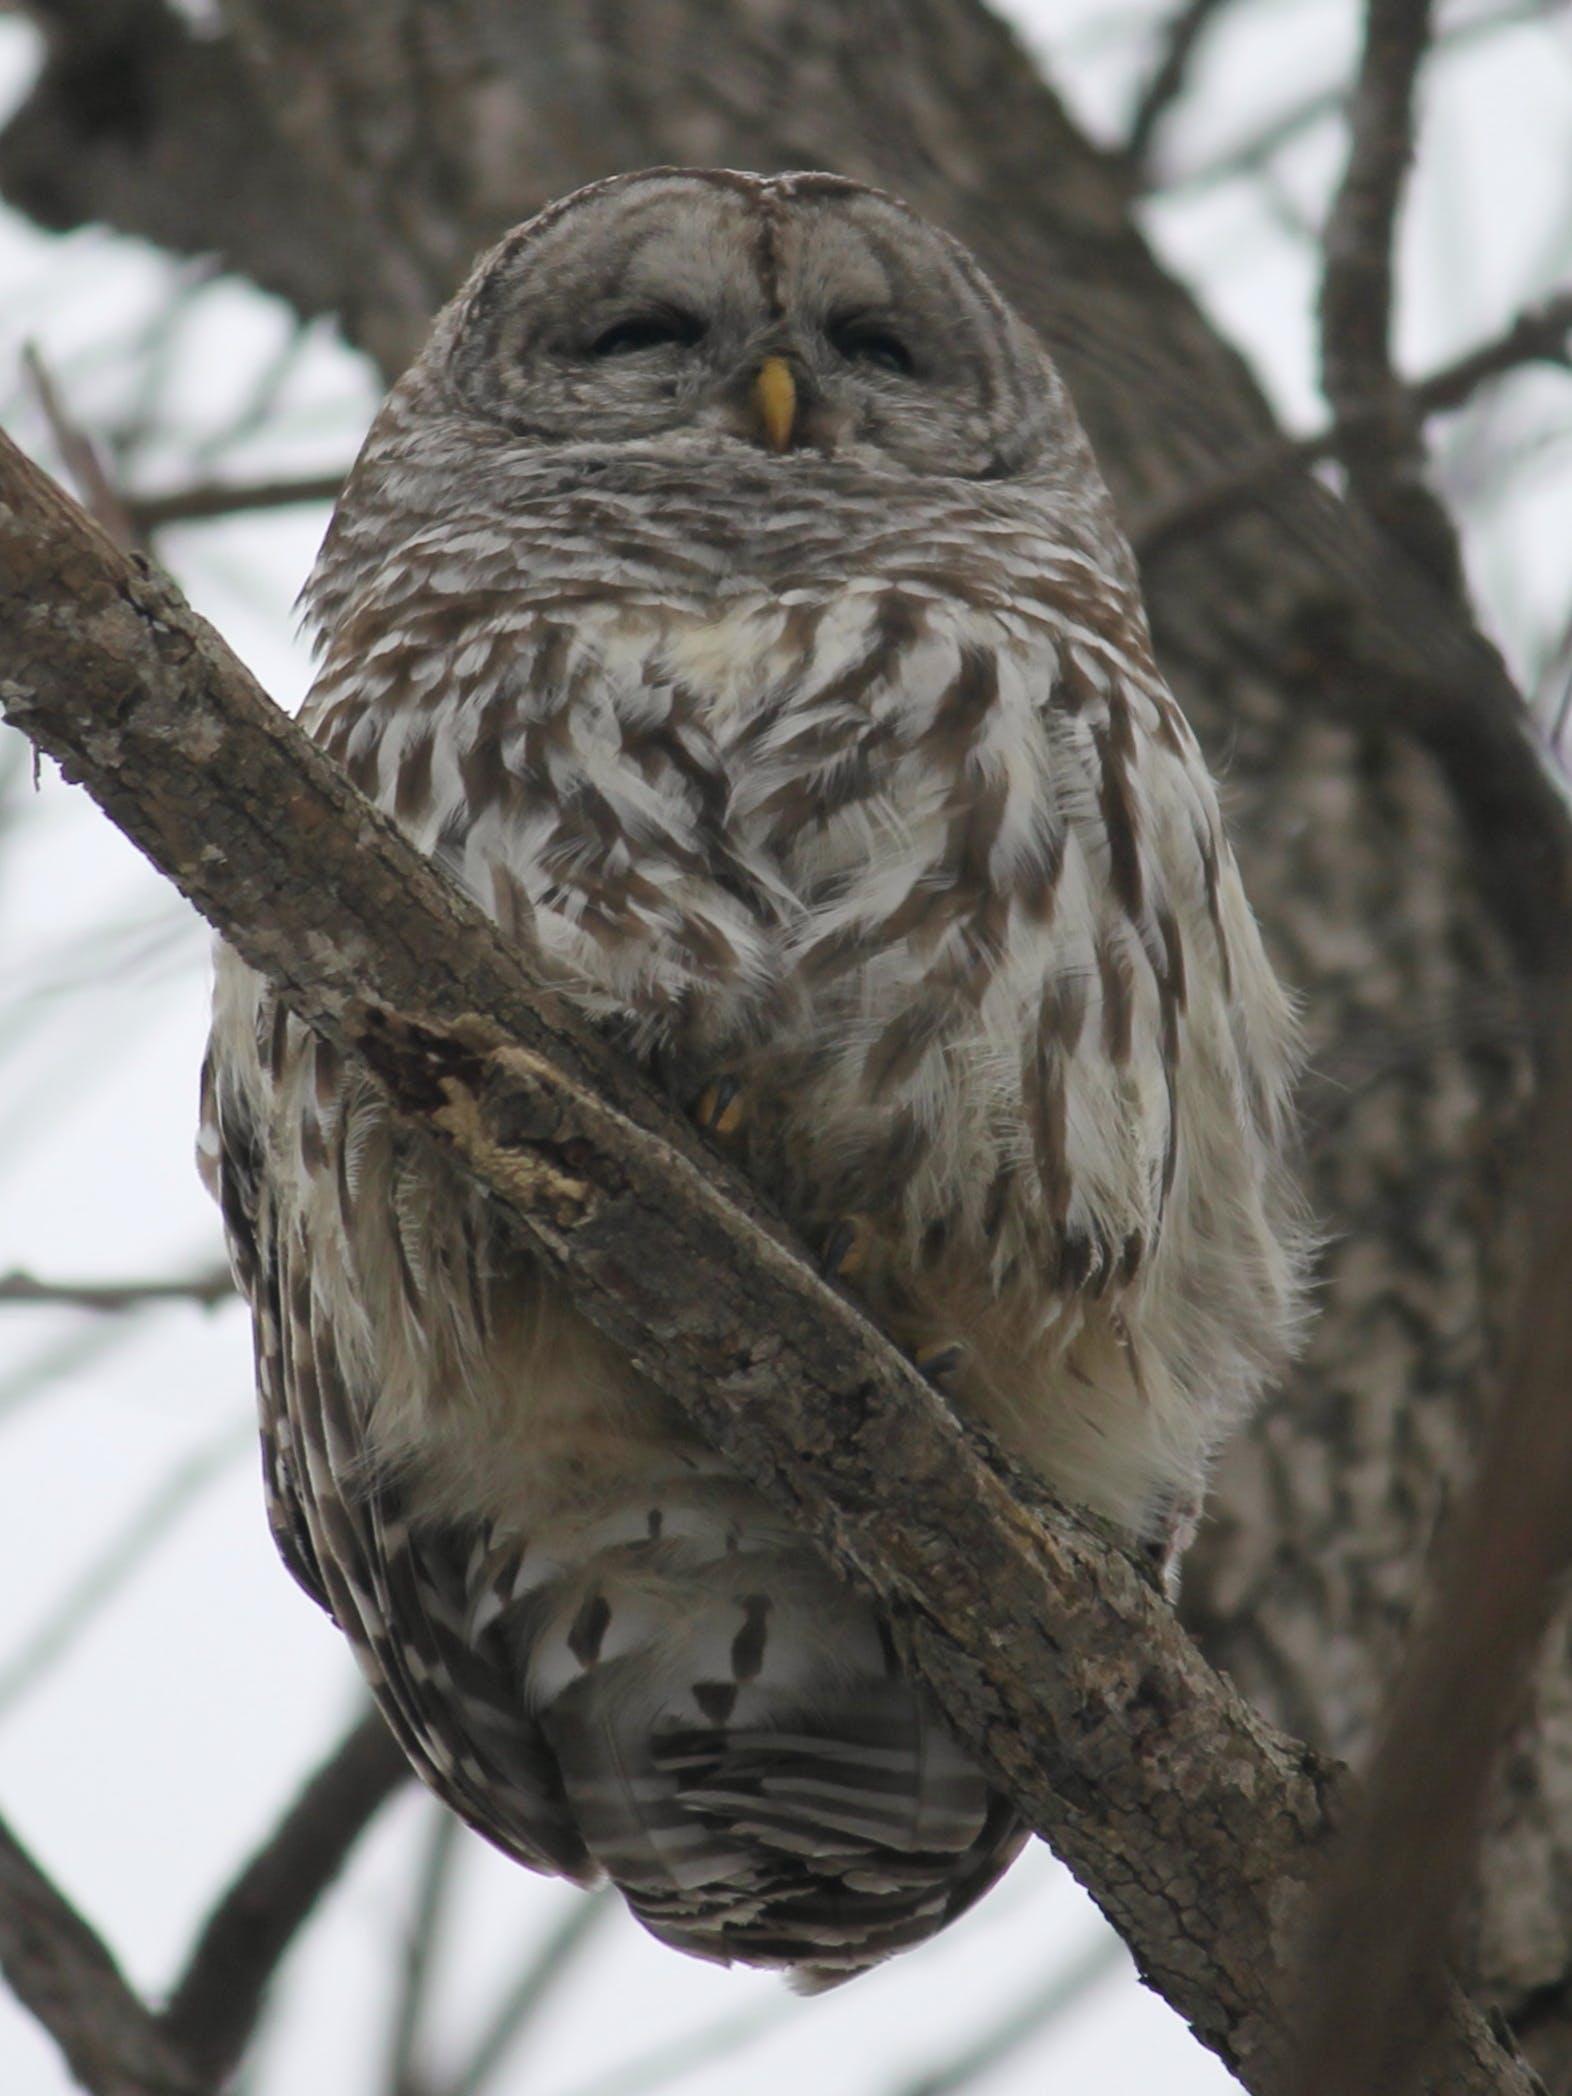 Free stock photo of Beard Owl   Birds   Nature   Winter